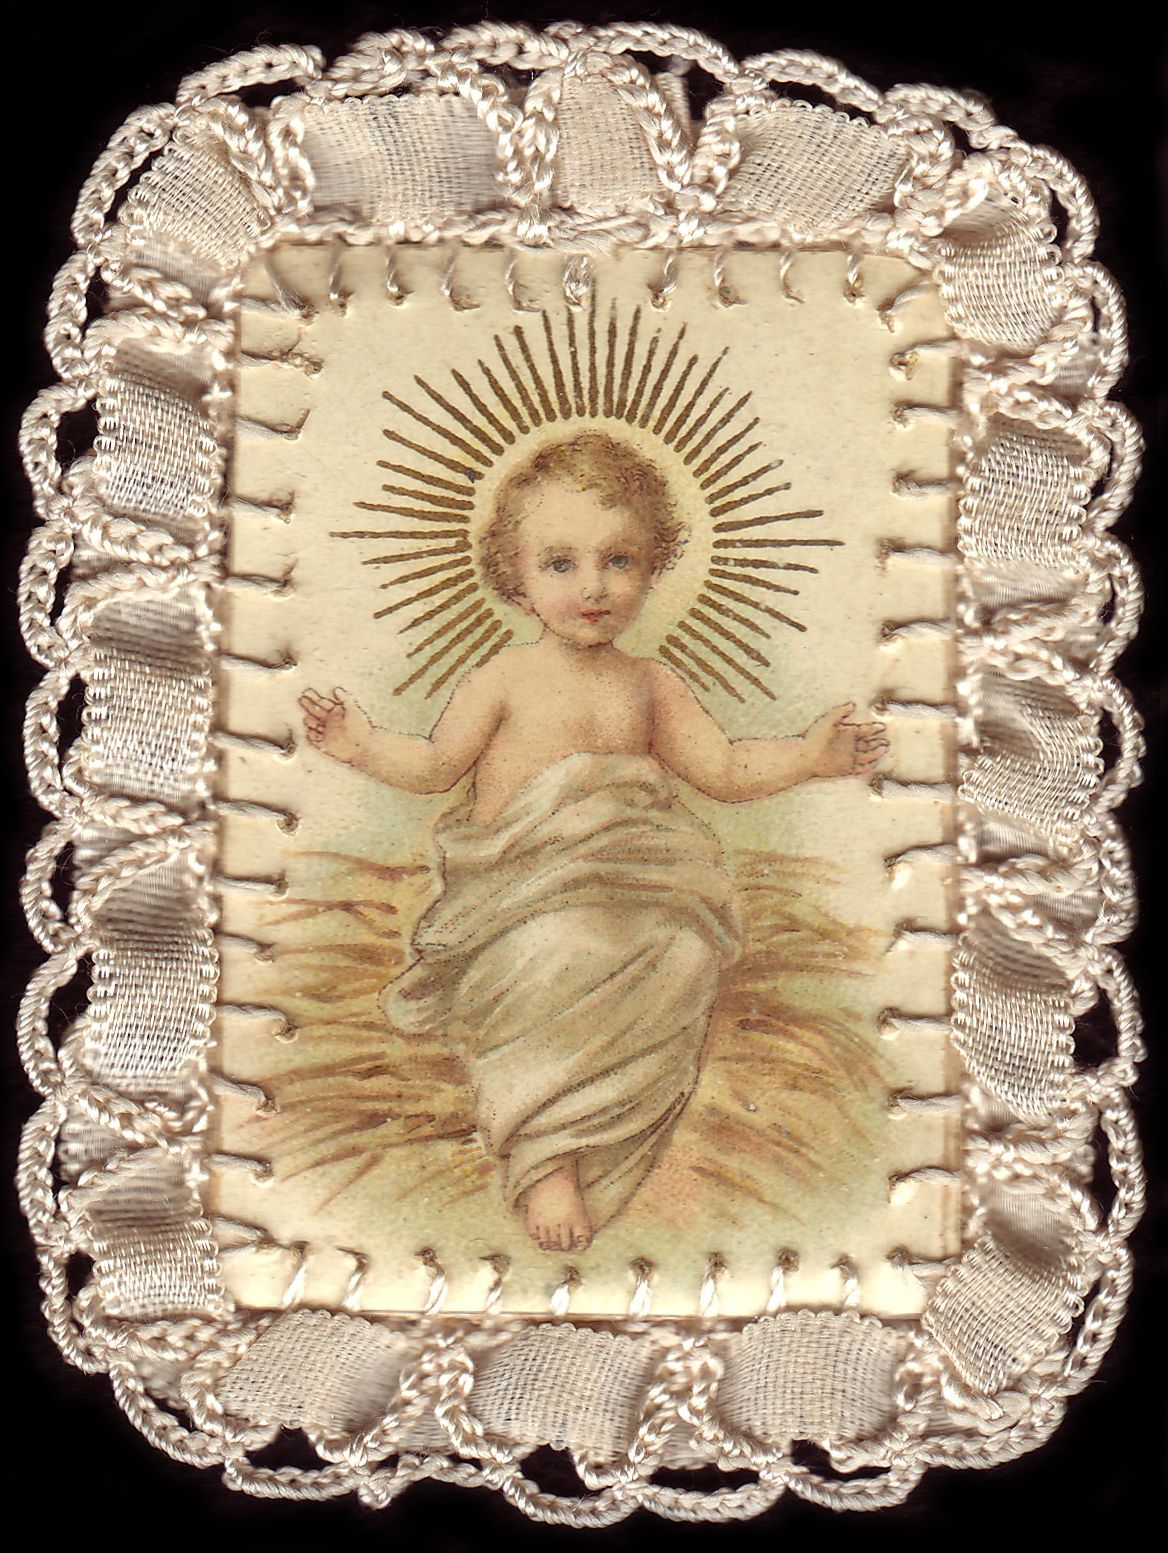 baby+Jesus+hand+made+by+Carmelites+-+very+old.jpg (1168×1553)